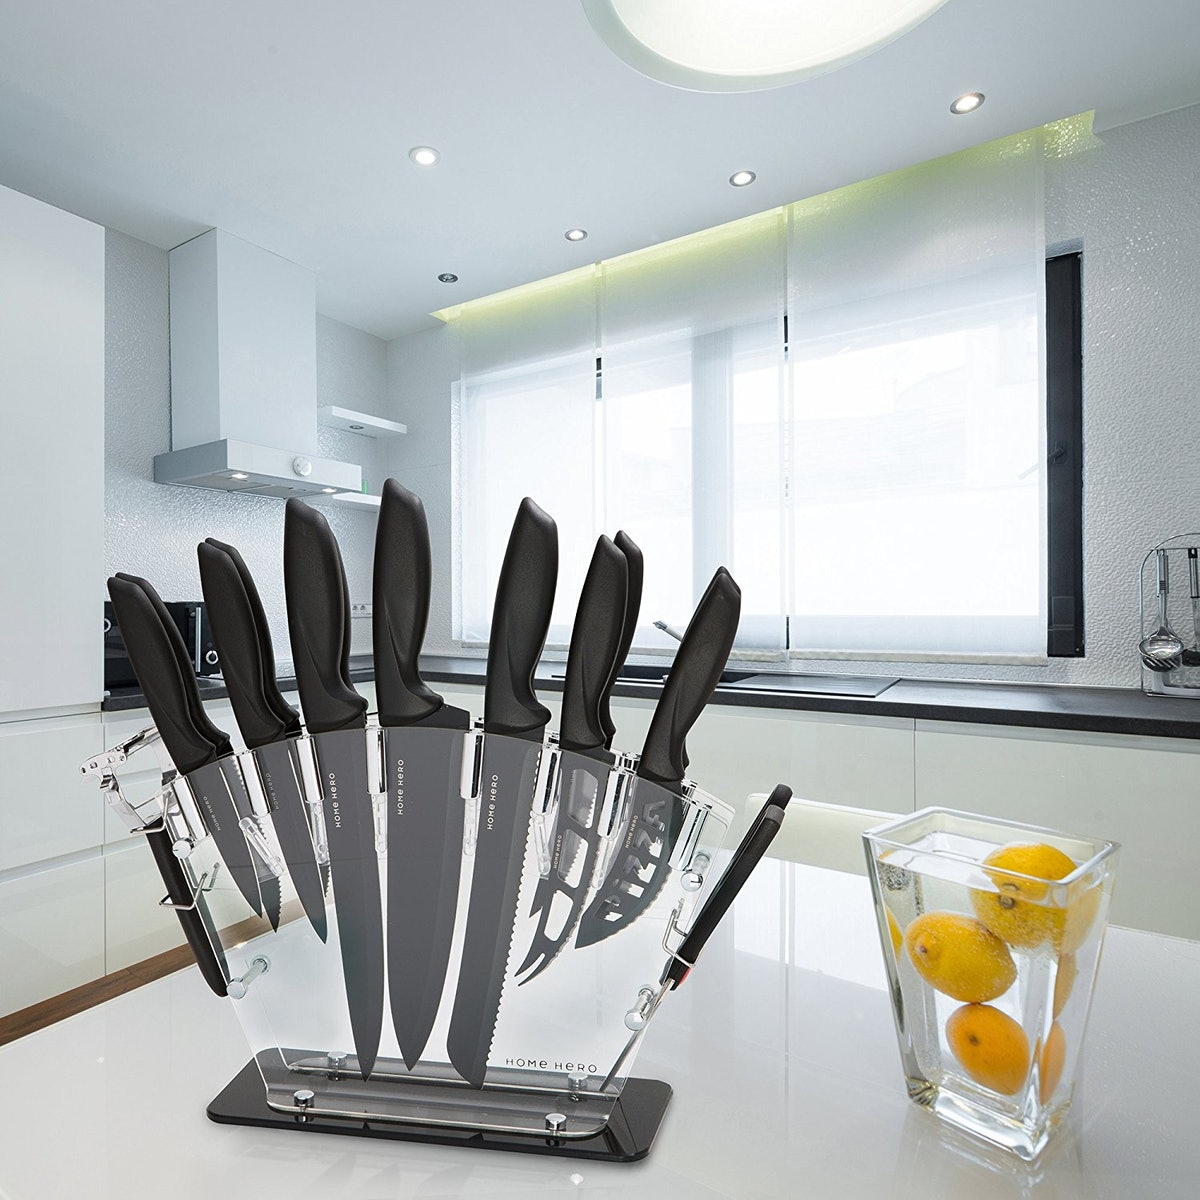 Home Hero Stainless Steel Knife Block Set